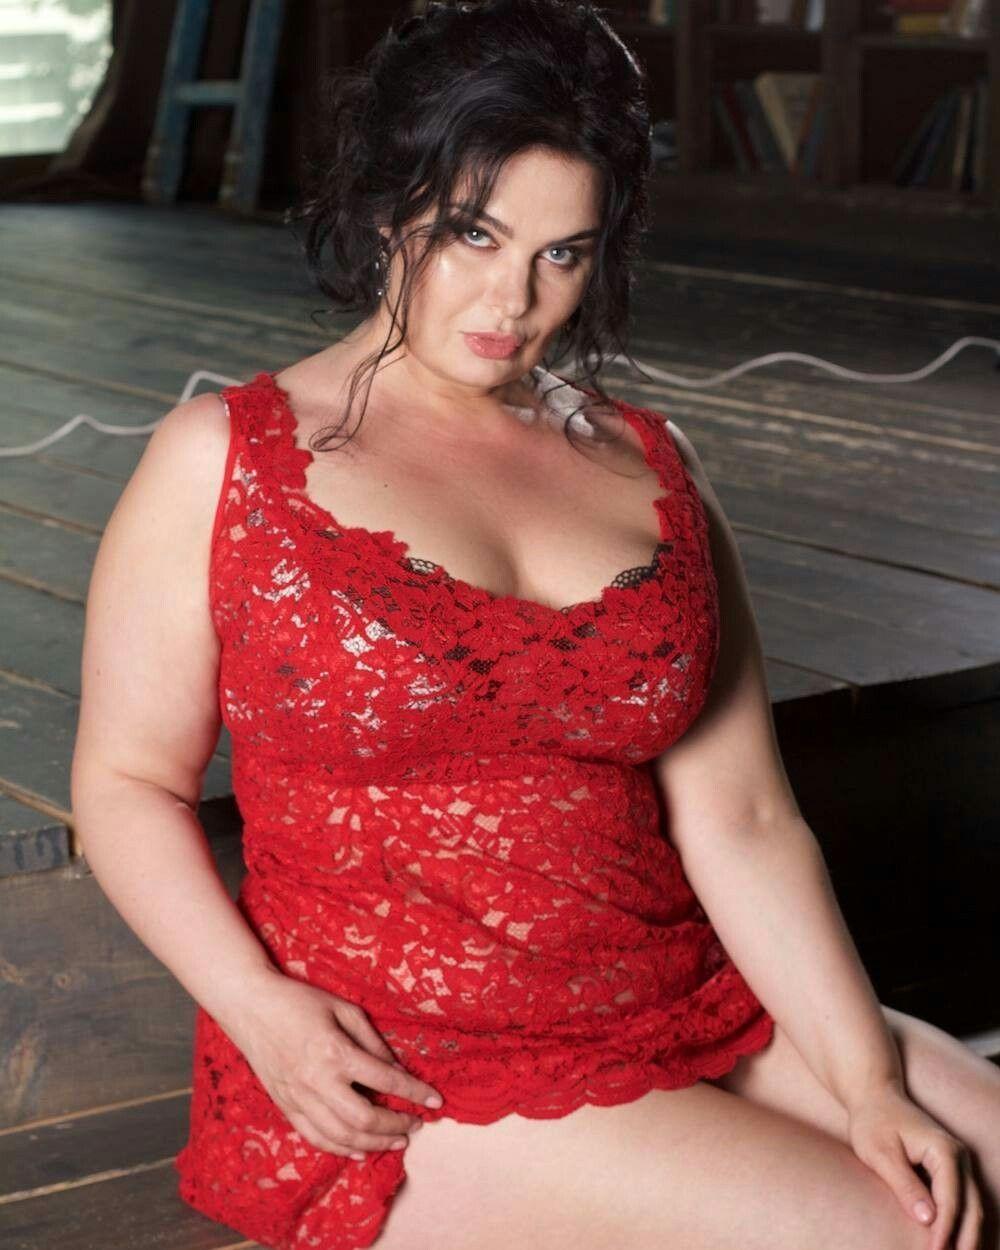 Badfeet F0 9f 91 A3 Olga Taranova Beautiful Curves Sexy Curves Curvy Girl Lingerie Red